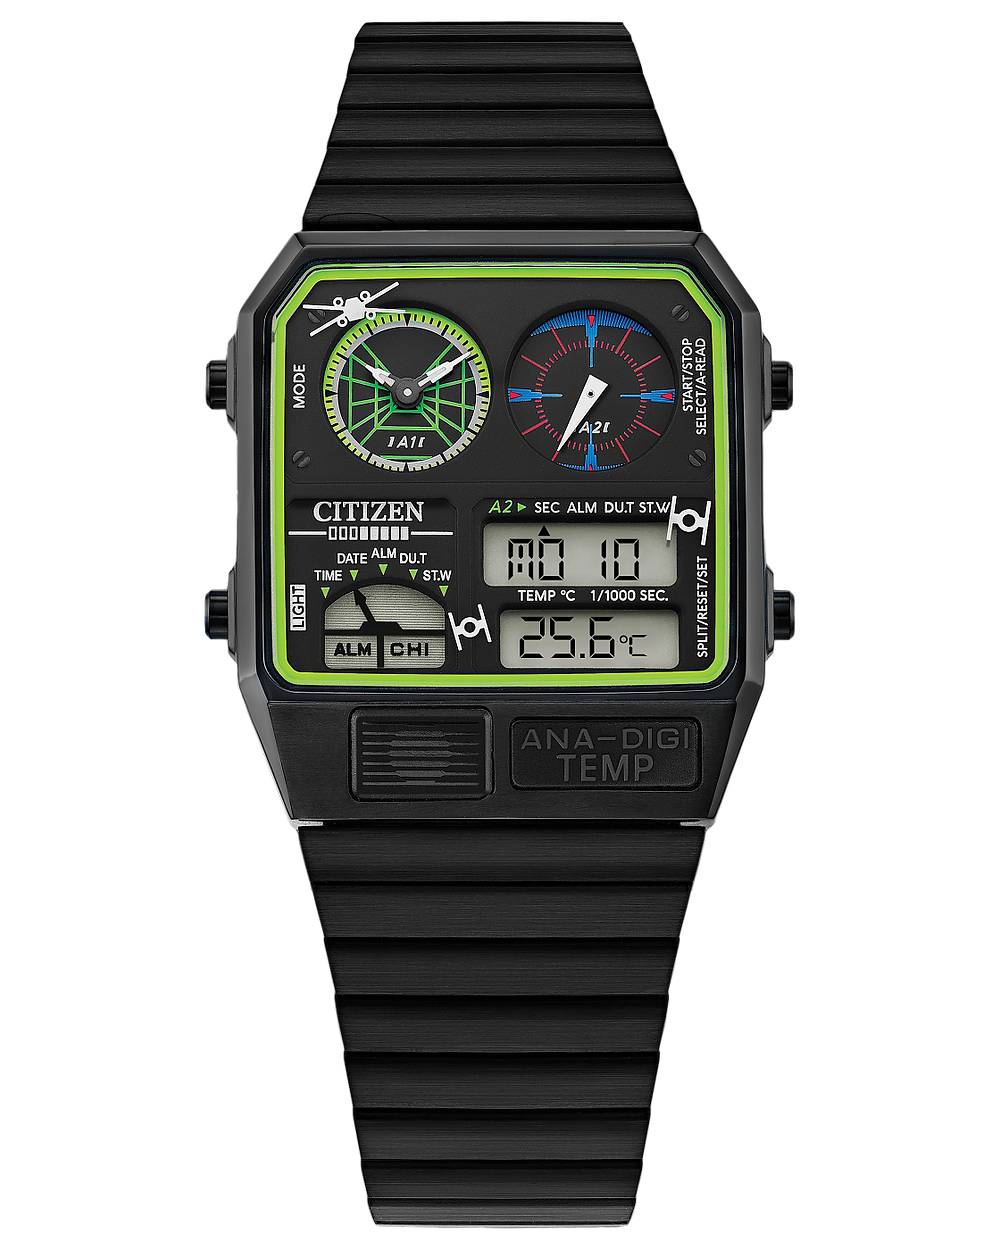 reloj citizen star wars Trench Run JG2109-50W